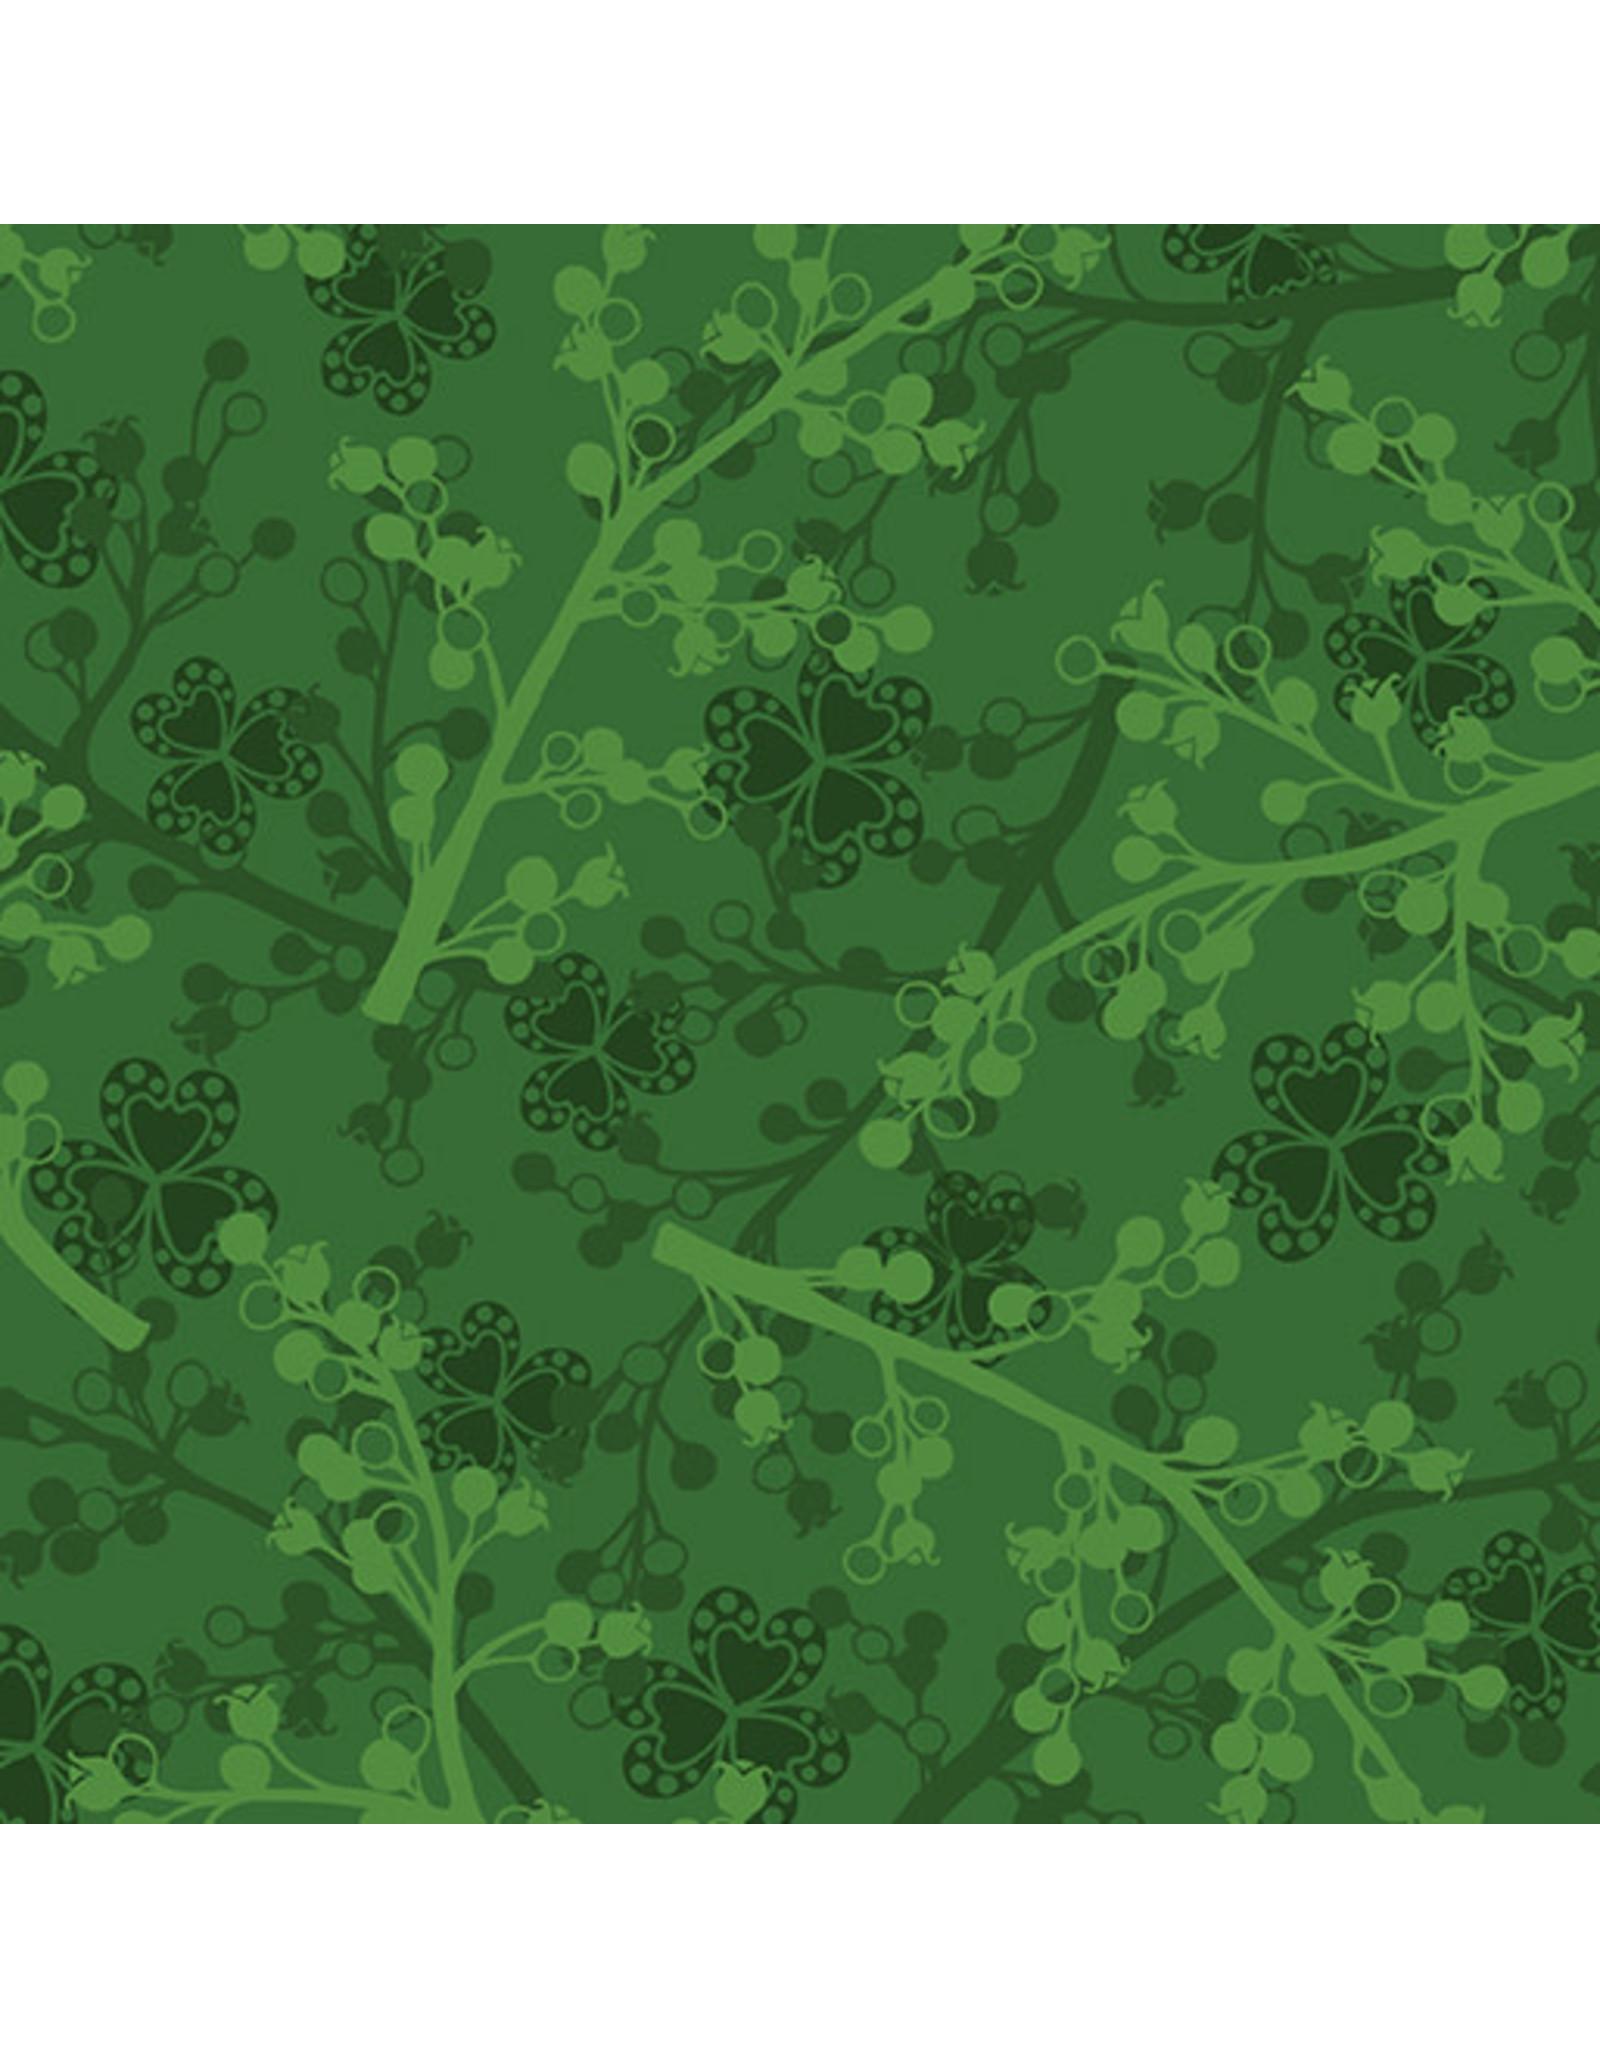 Contempo Jubilee - Berries Pine